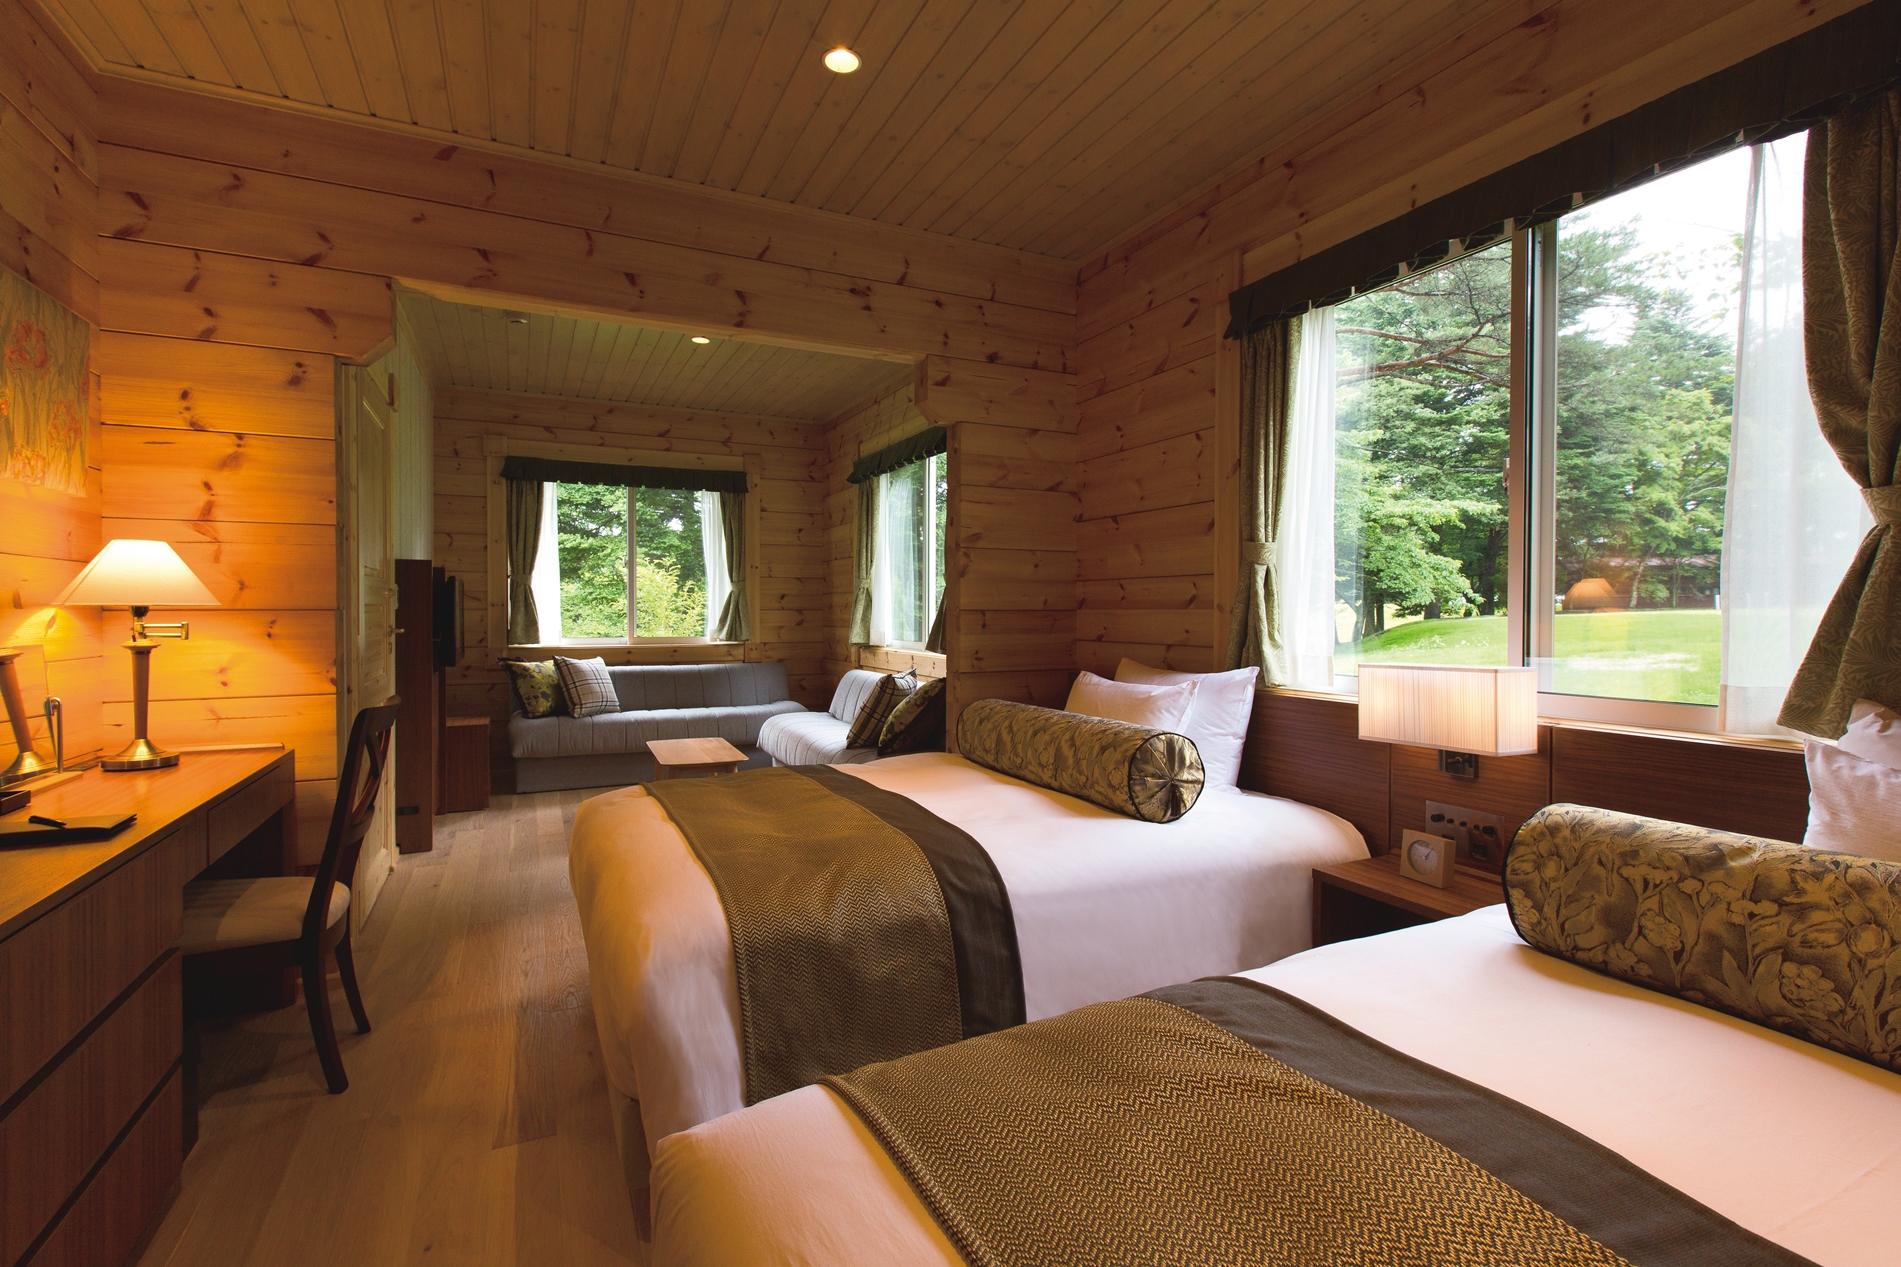 Maisonette Spa (2-Stories Villa with Hot Springs)